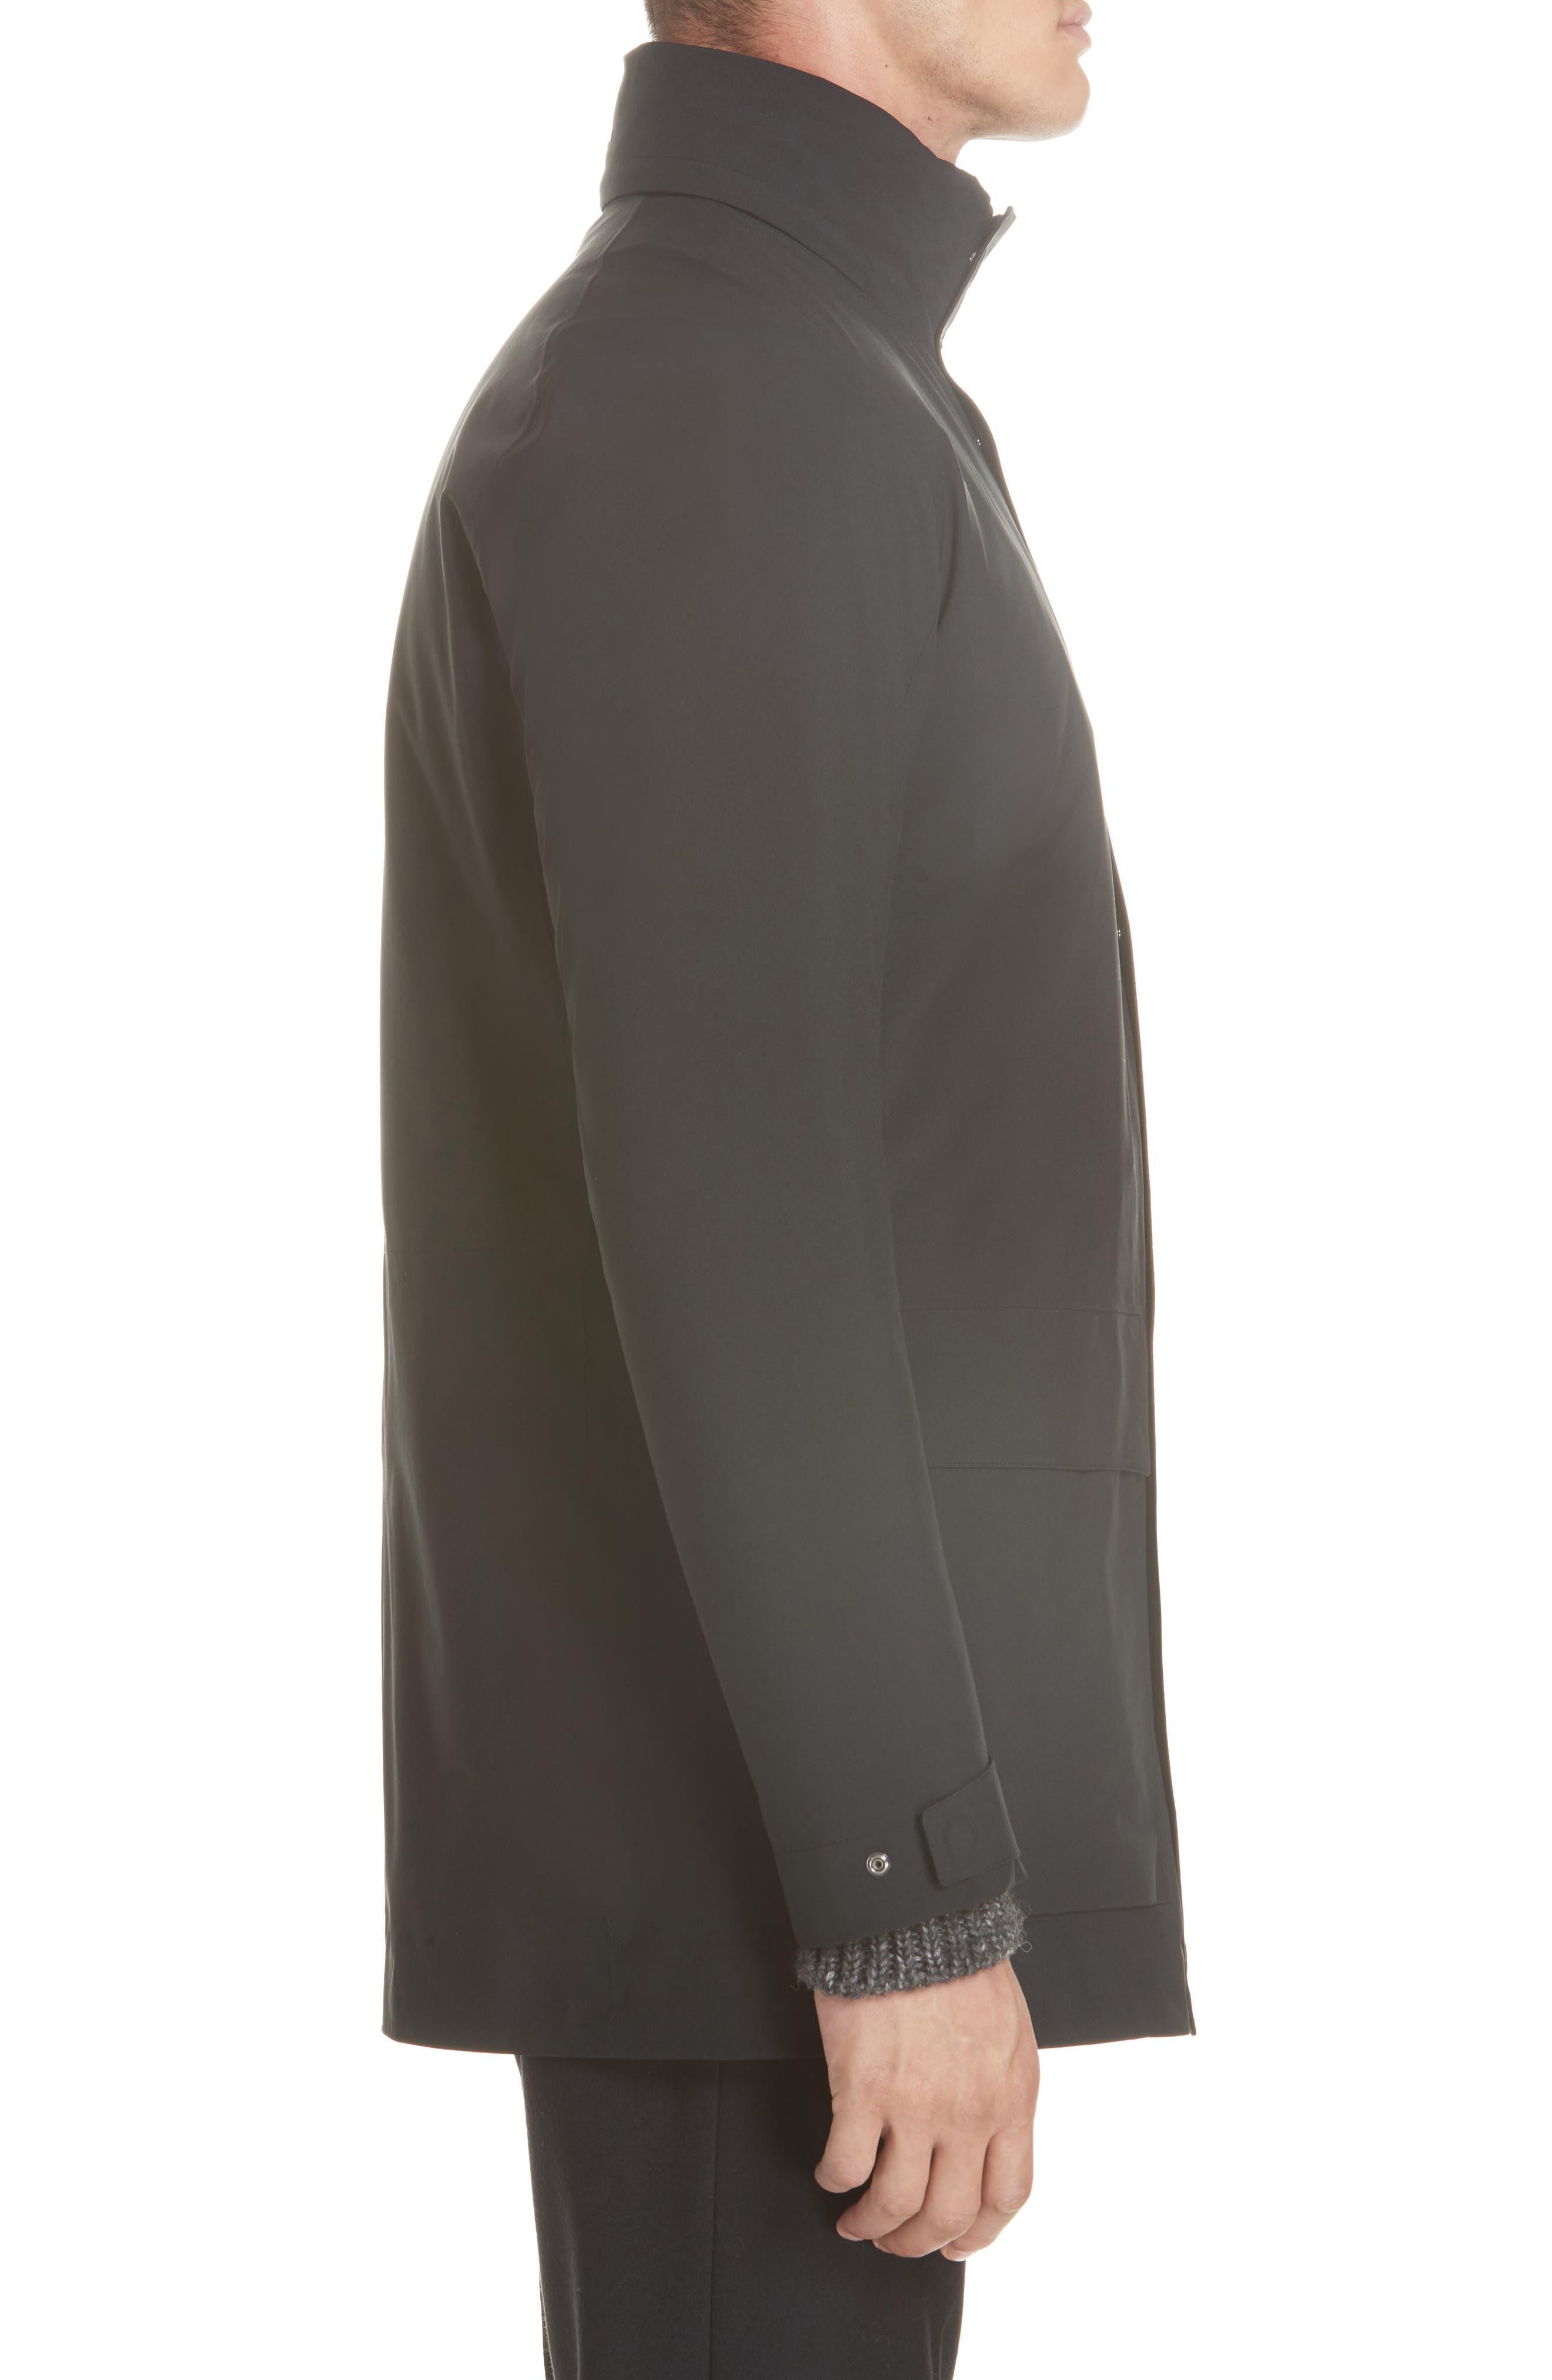 Z Zenga Trim Fit 3-in-1 Jacket,                             Alternate thumbnail 4, color,                             BLACK